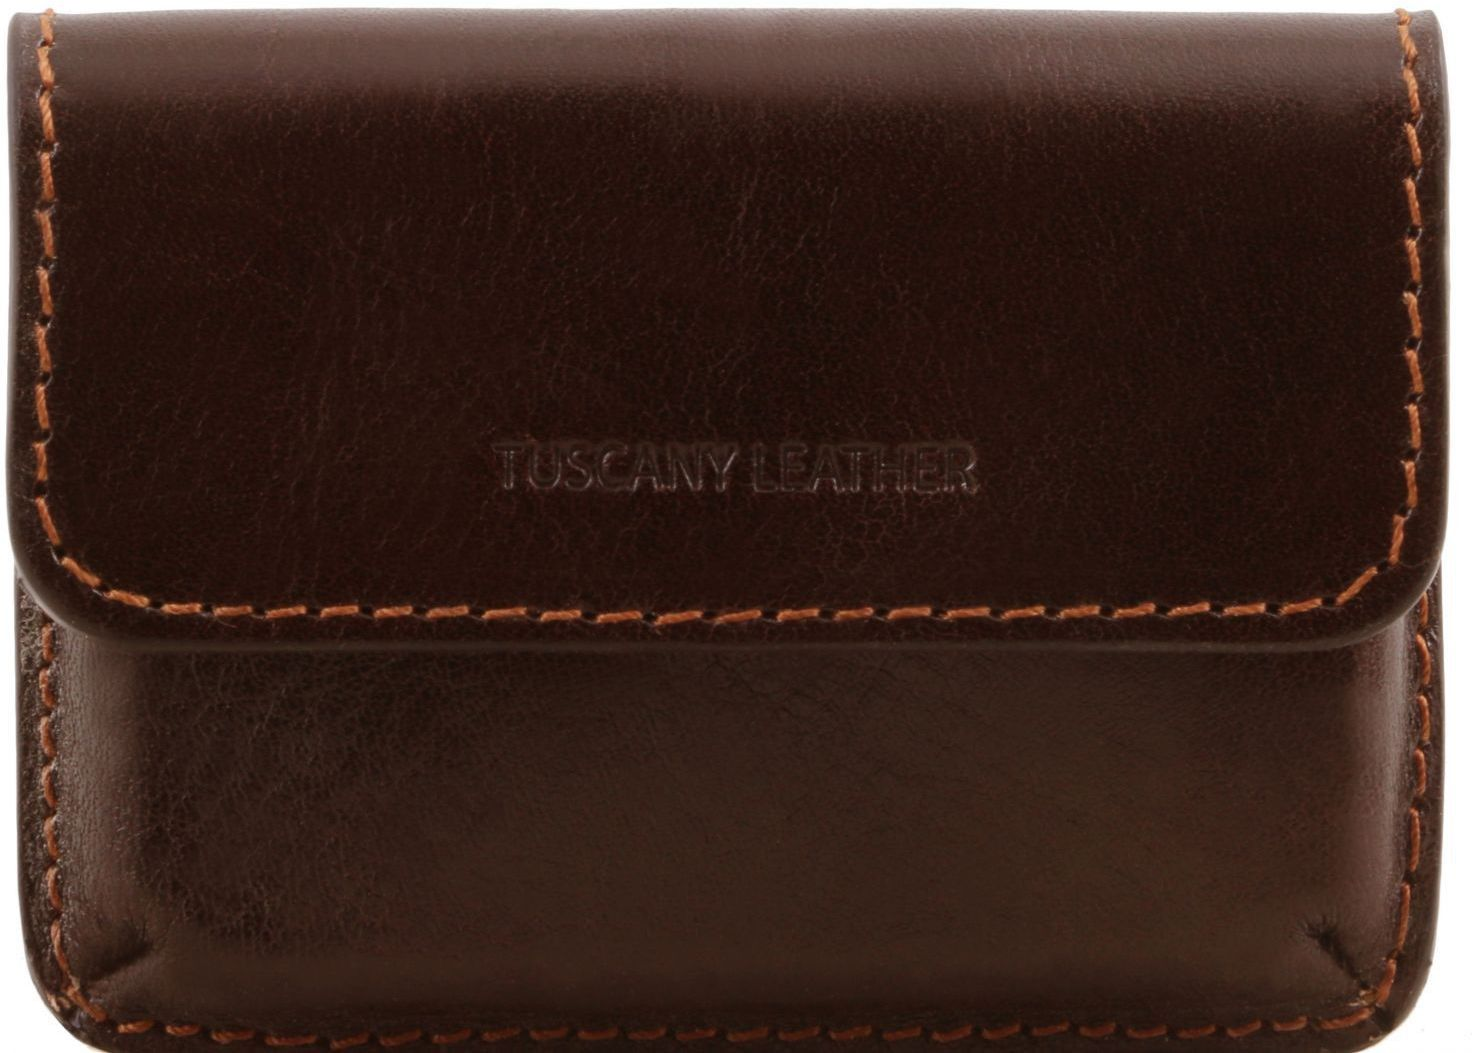 c83051d799 Δερμάτινη θήκη για Επαγγελματικές Κάρτες TL141378 Καφέ σκούρο Tuscany  Leather